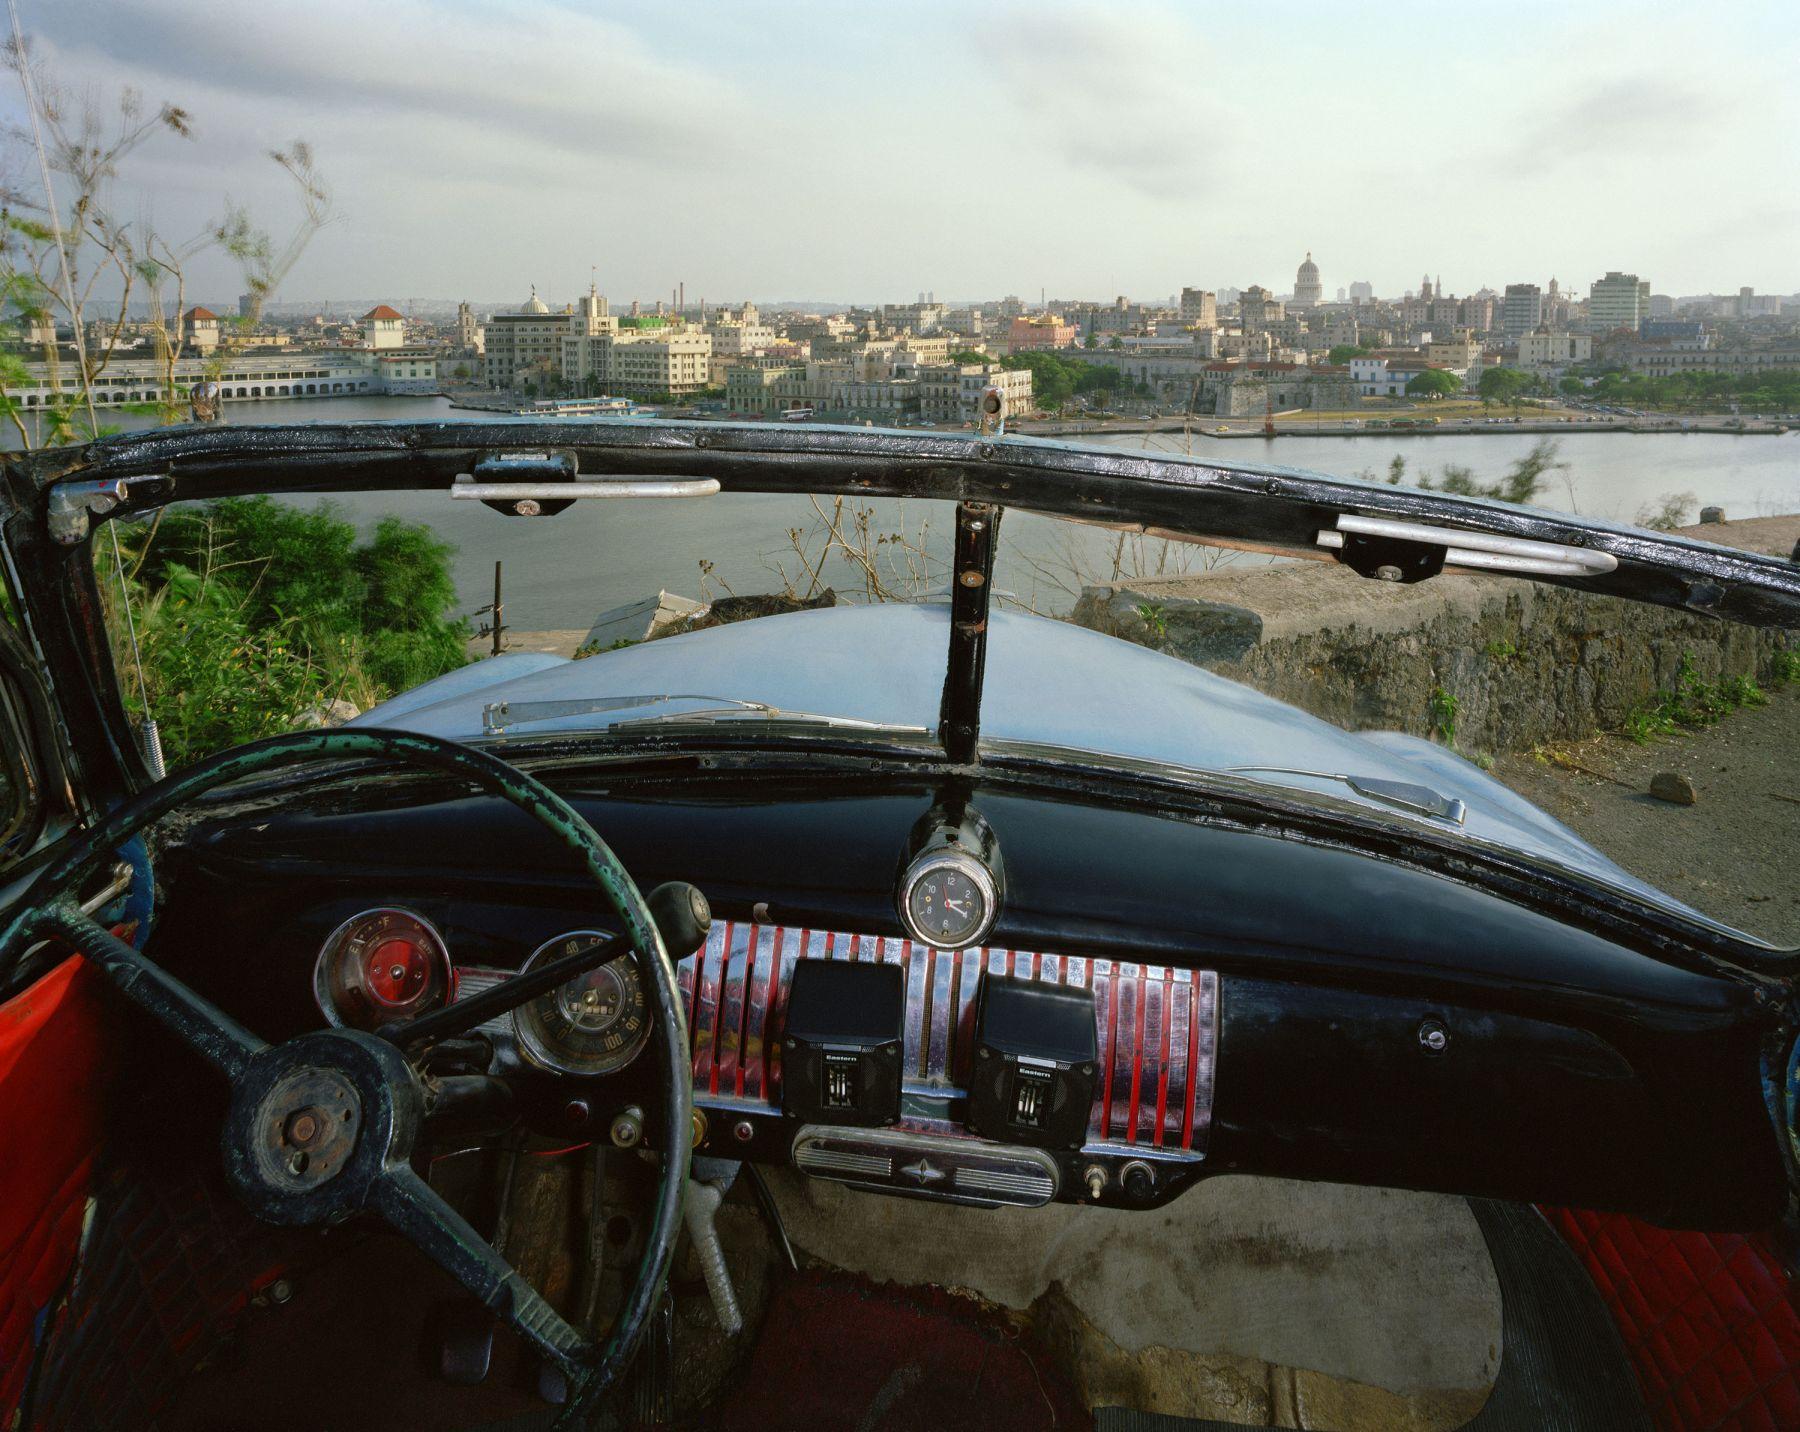 ALEX HARRIS  View of Havana from El Cristo de Casa Blanca, looking south from Ricardo Moya Silveira's 1951 Chevrolet May 24, 1998